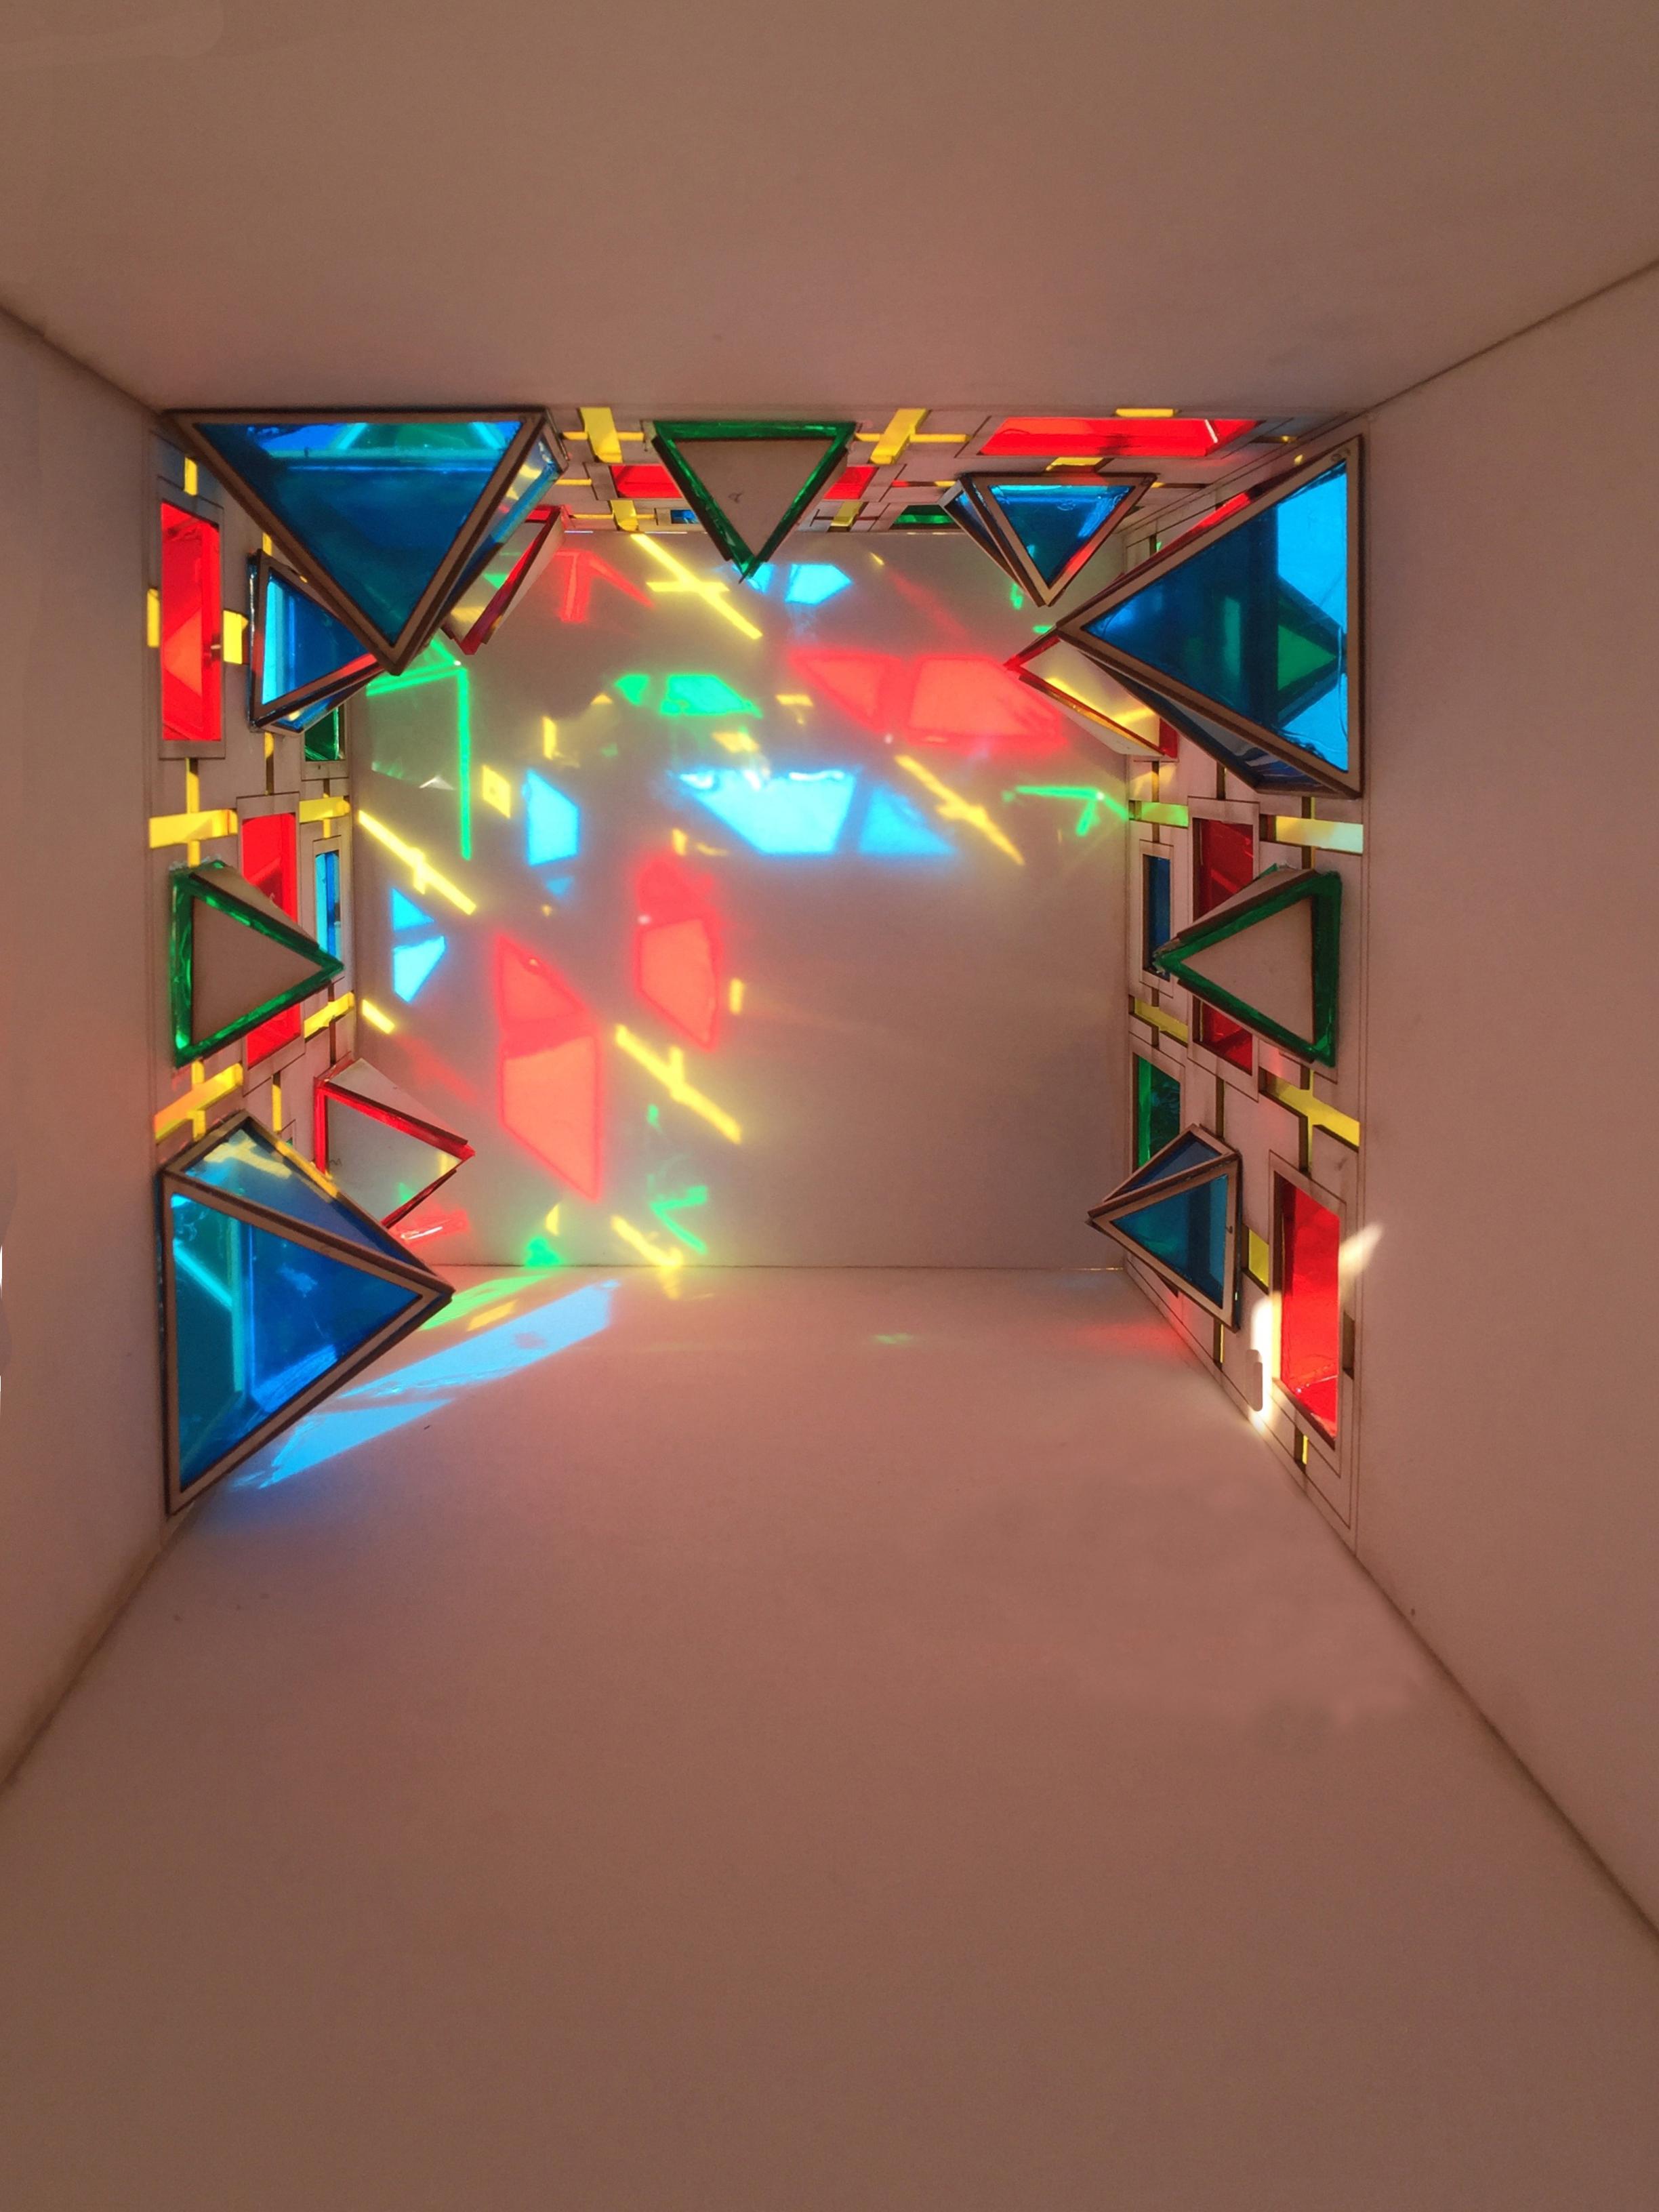 sibel-agun-mps-l-kaleidoscope-box_34901795690_o.jpg